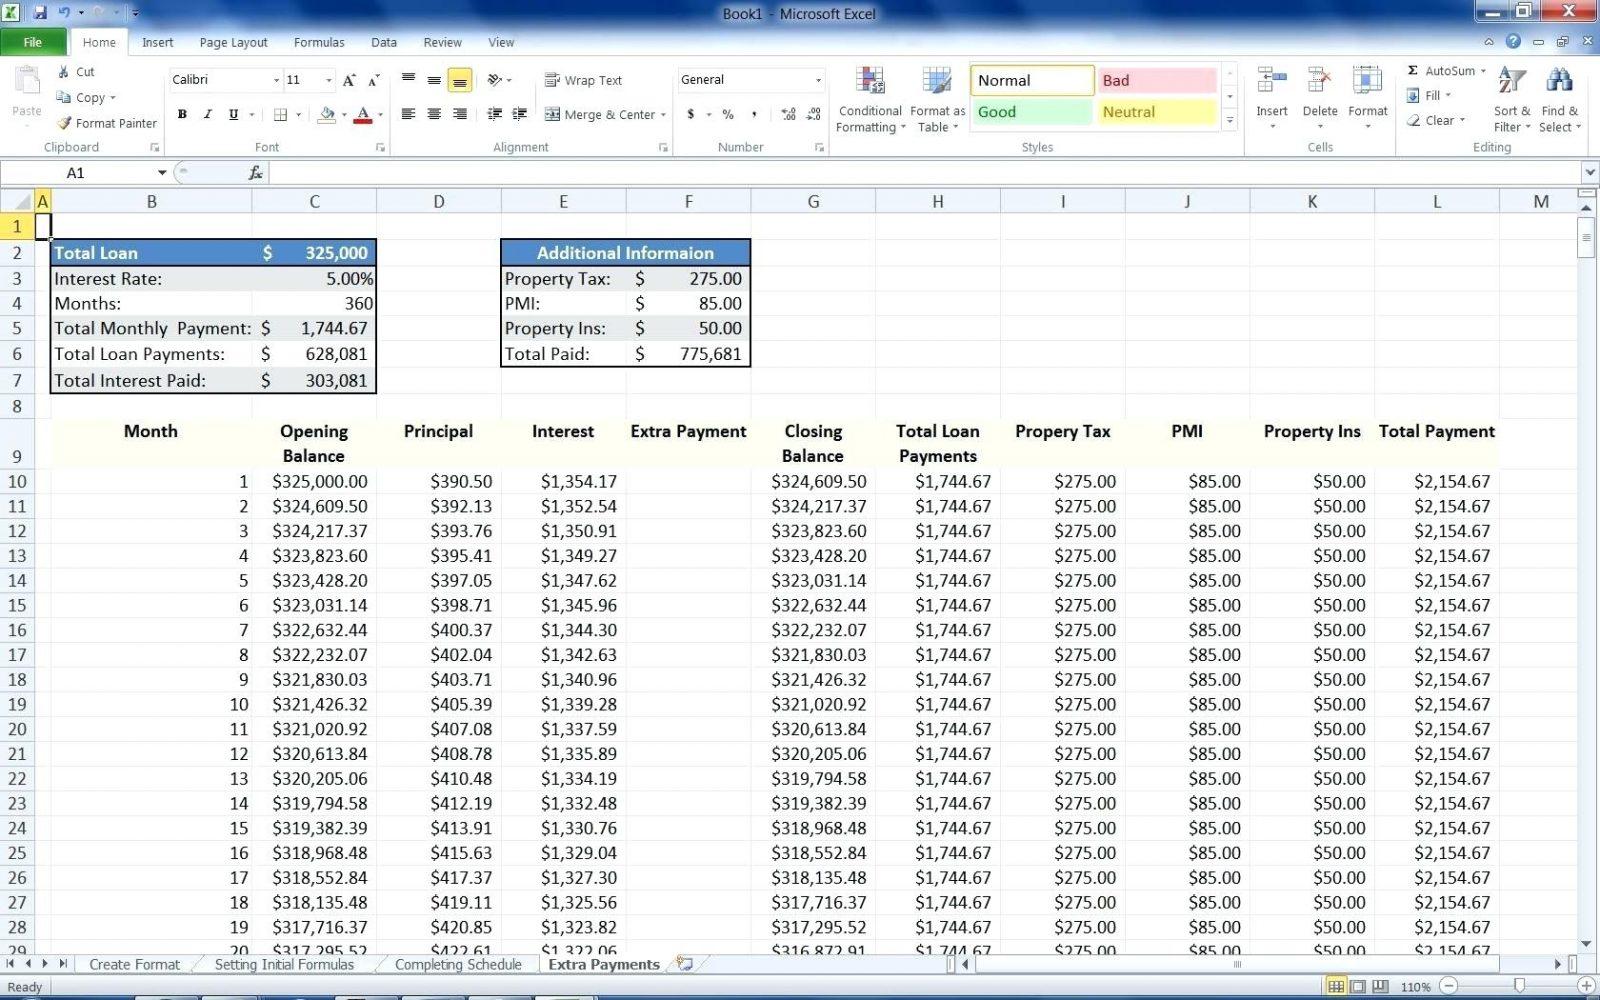 Mortgage Spreadsheet Formula Pertaining To Form Mortgage Spreadsheet Formula Examples Templatel Loan Calculator